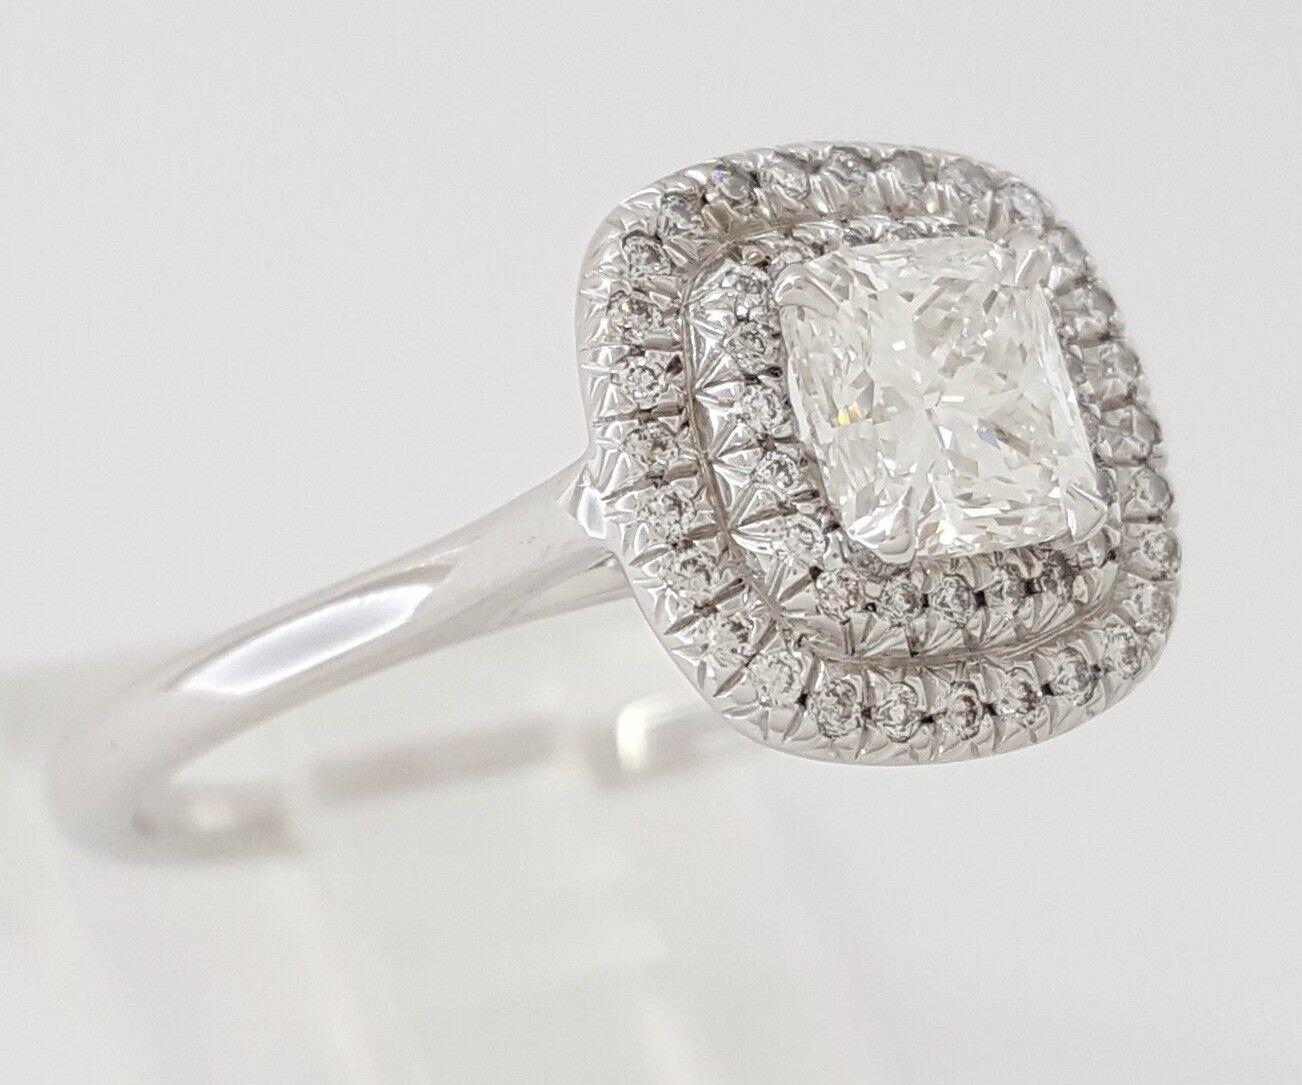 0.97 ct 18K White Gold Cushion Cut Diamond Double Halo Engagement Ring GIA E/VS1 3